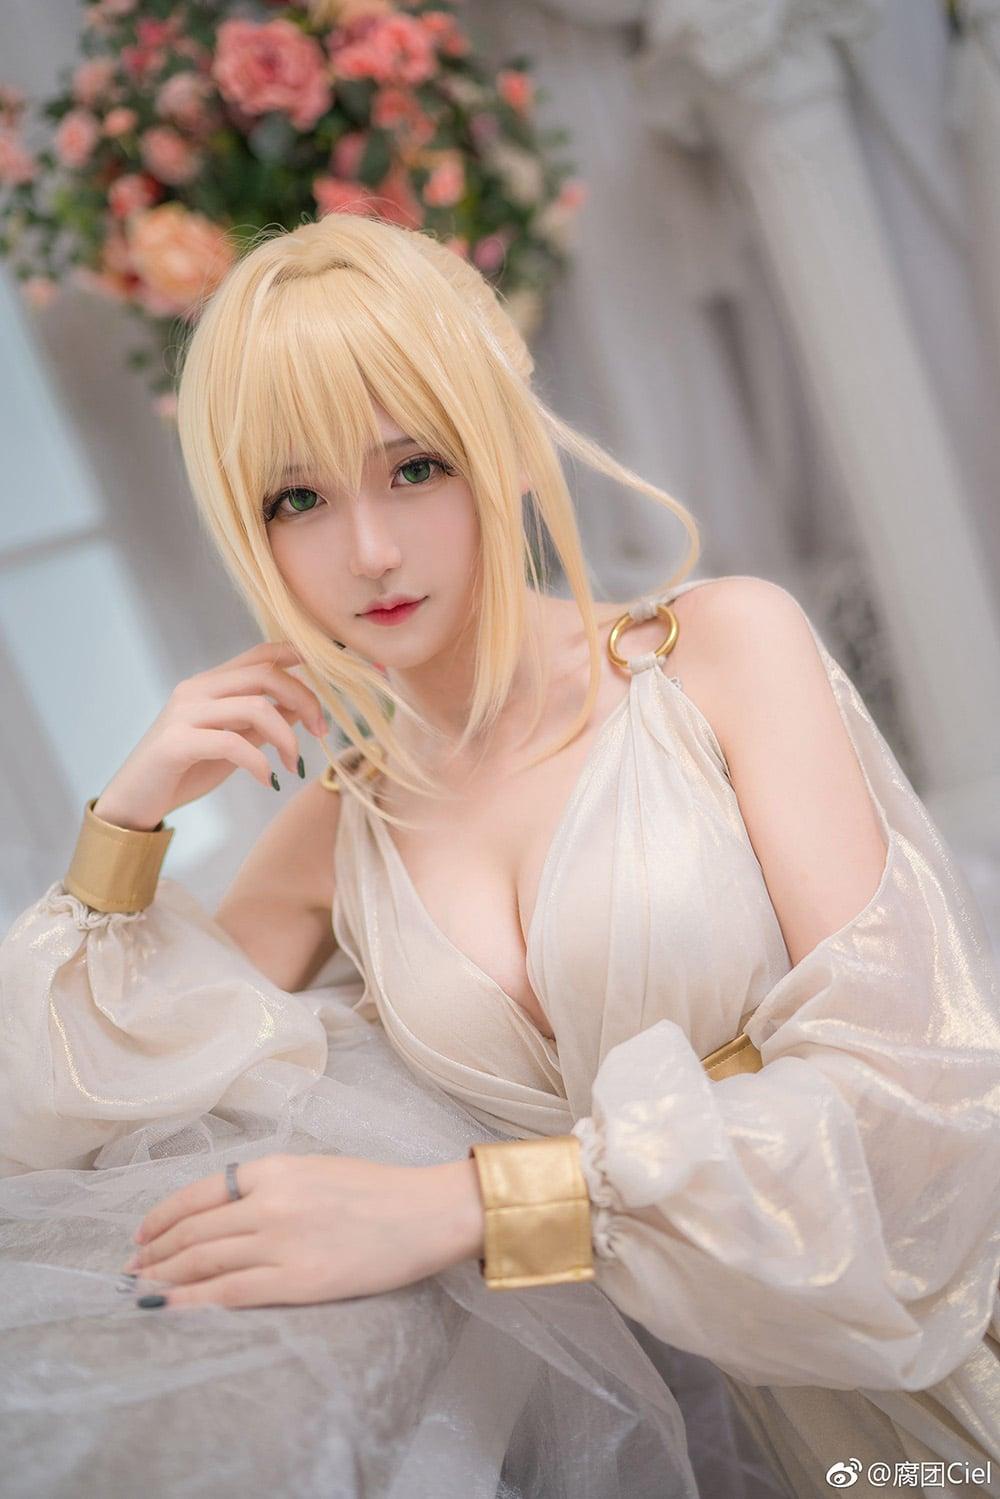 Ngắm nàng saber Nero Claudius cực kỳ kiều diễm trong Fate/Grand Order